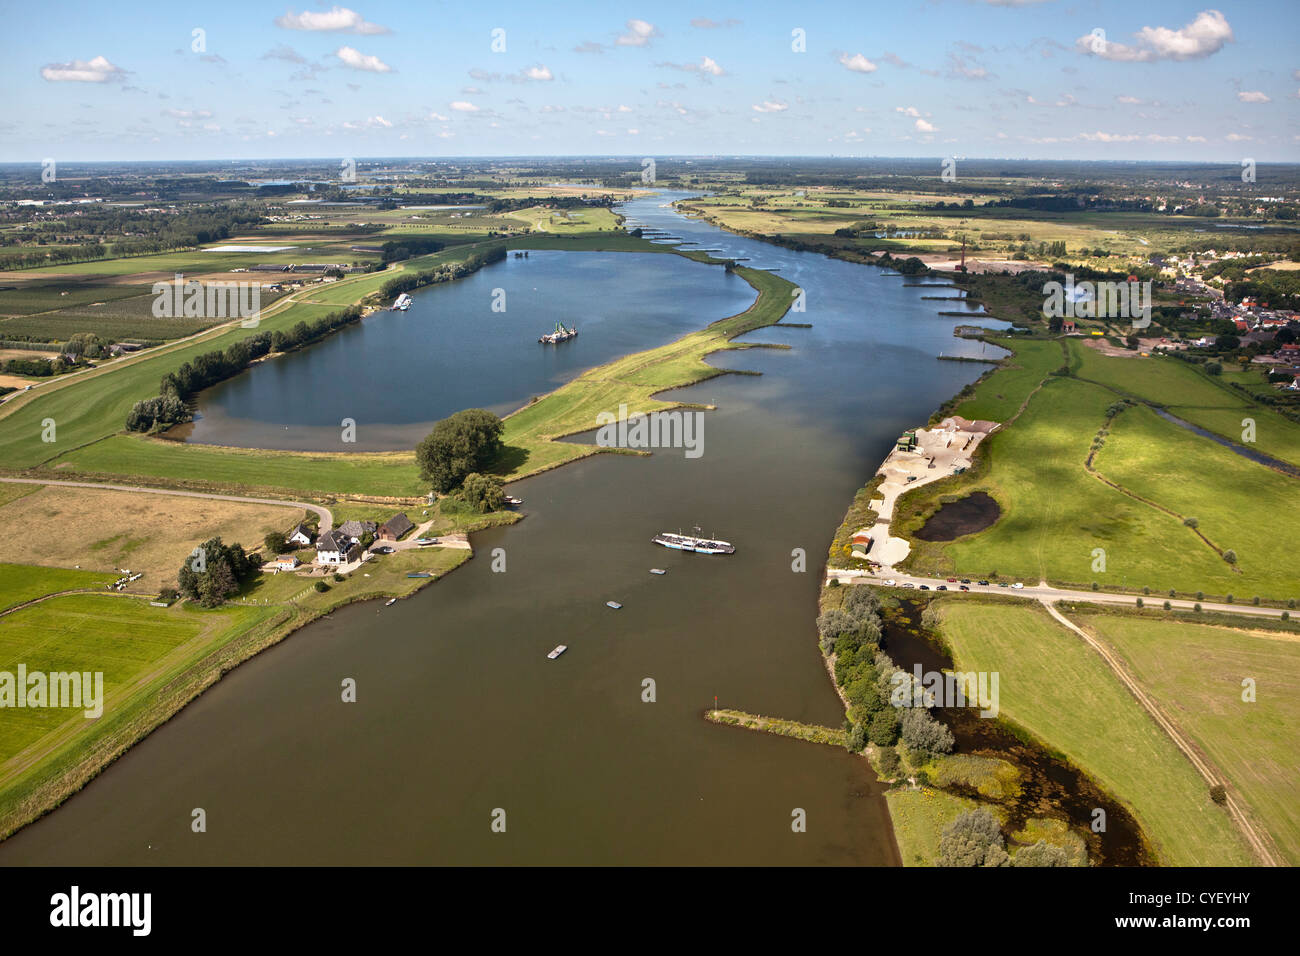 The Netherlands, Eck en Wiel, Ferry crossing Rhine river. Aerial. - Stock Image